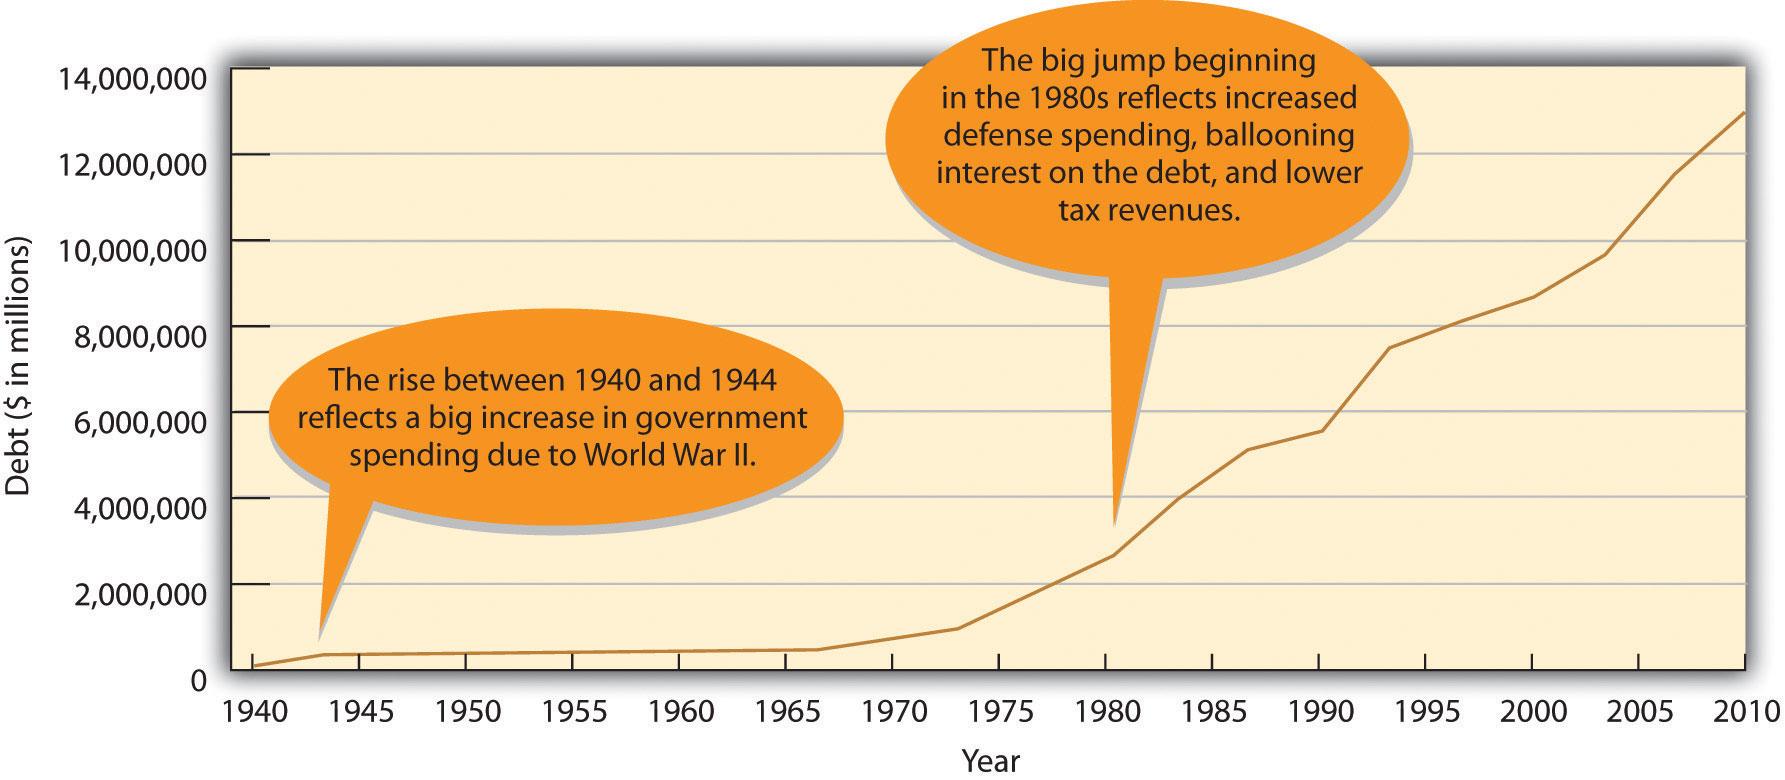 The U.S. National Debt, 1940-2010